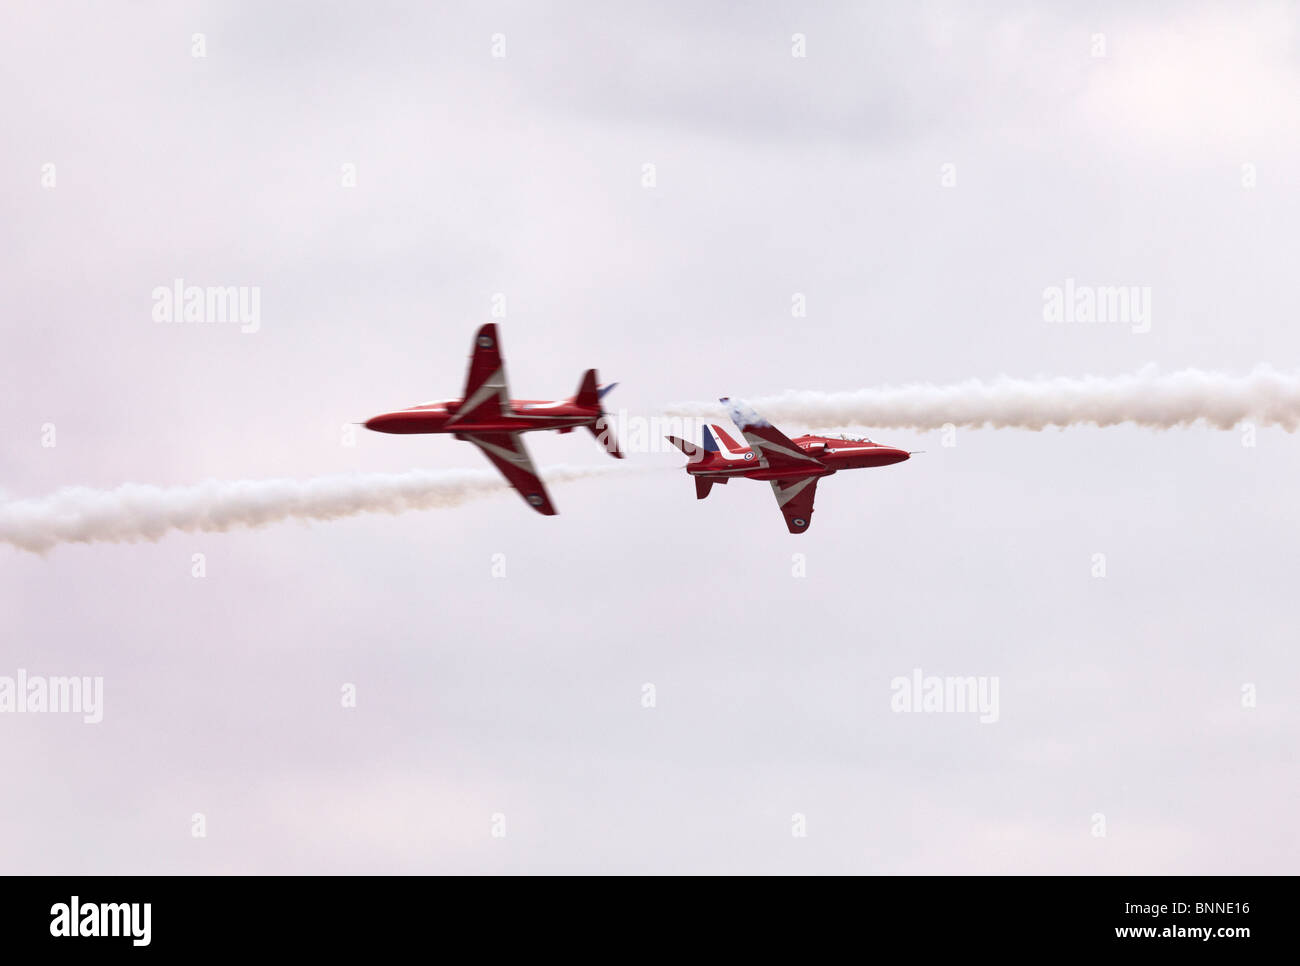 Farnborough Red Arrows RAF Hawk aerobatic display team synchro pair - Stock Image